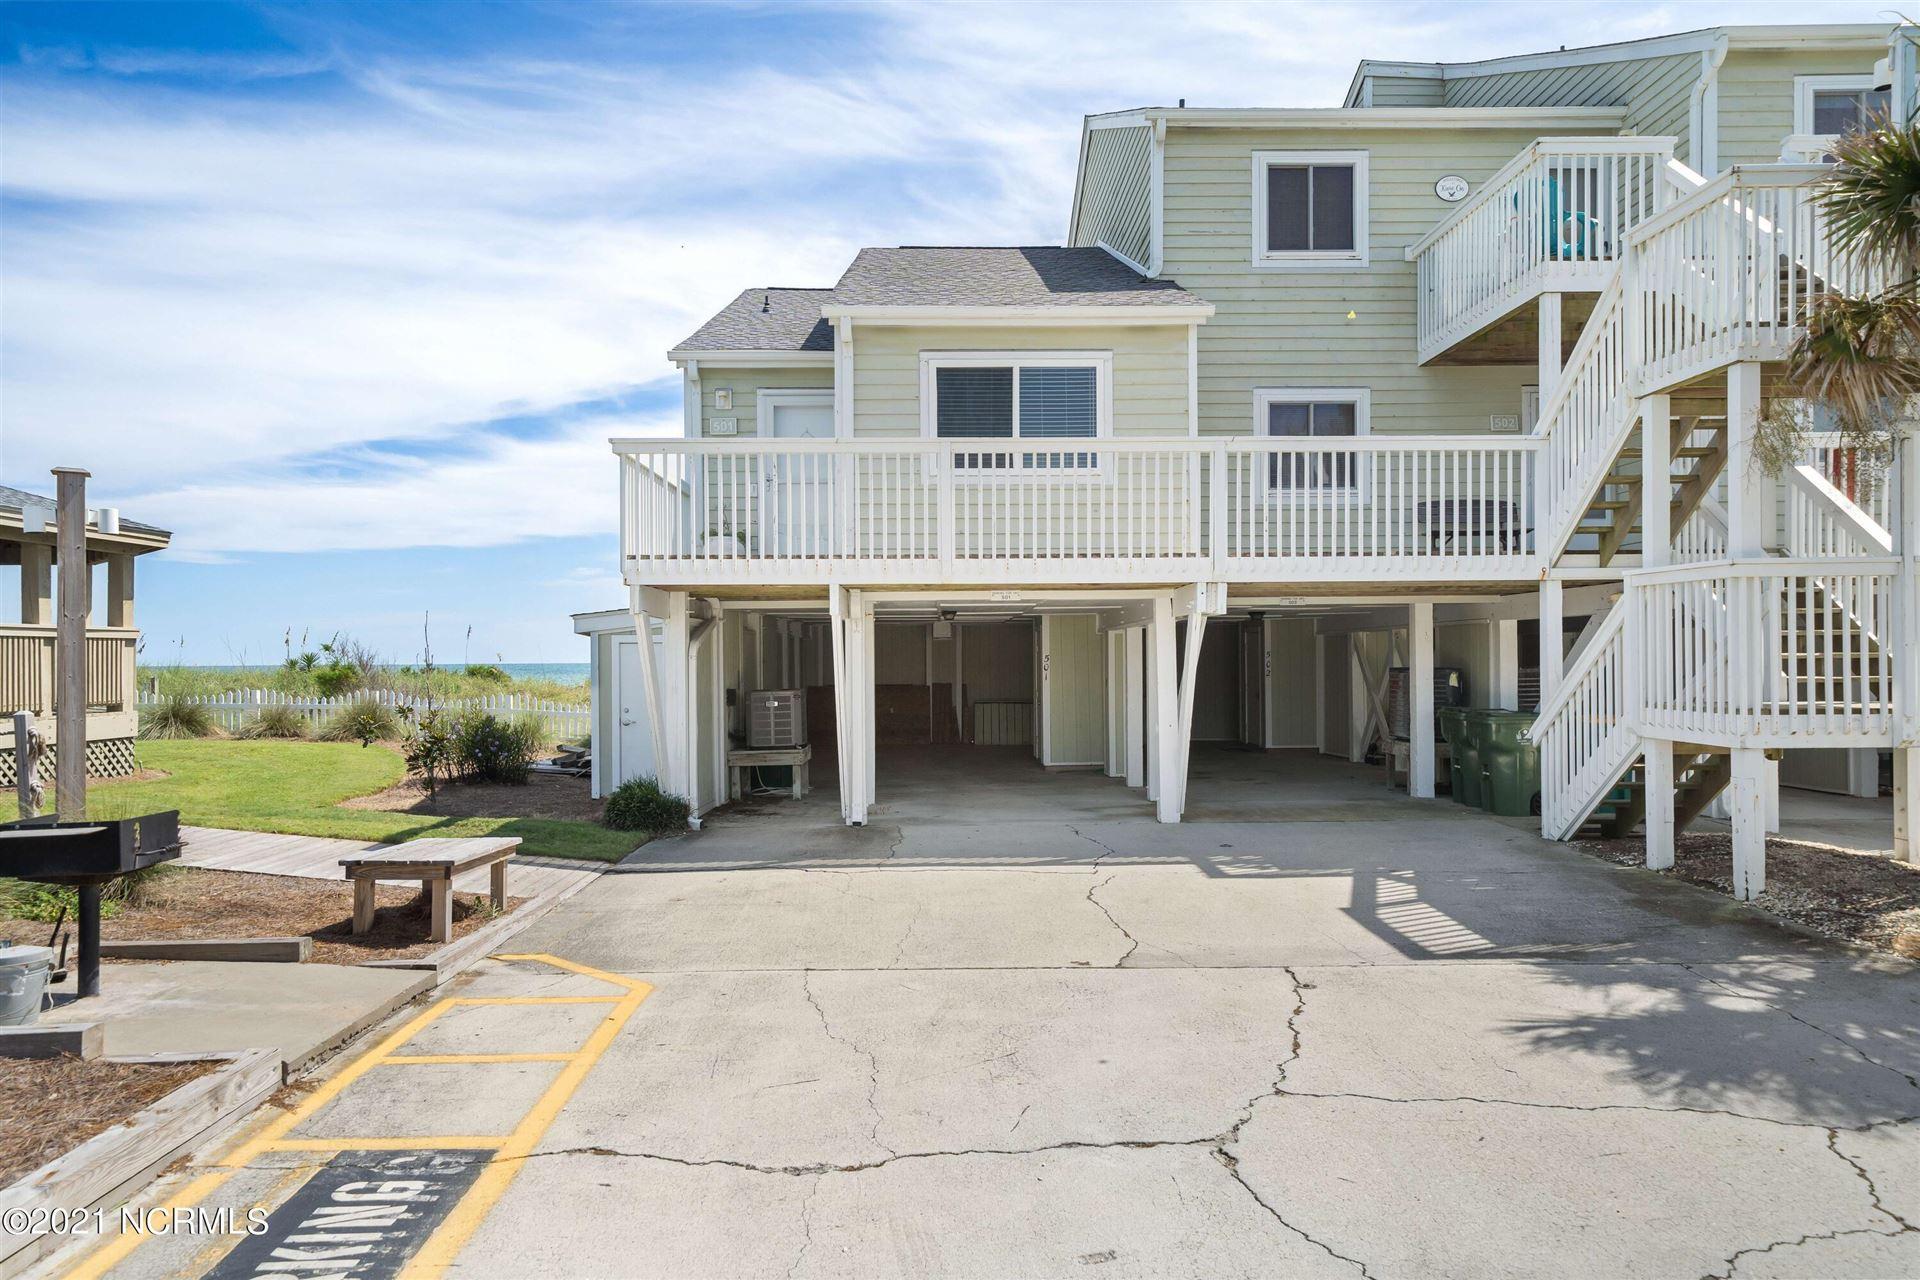 Photo of 501 Pelican Court, Kure Beach, NC 28449 (MLS # 100290987)